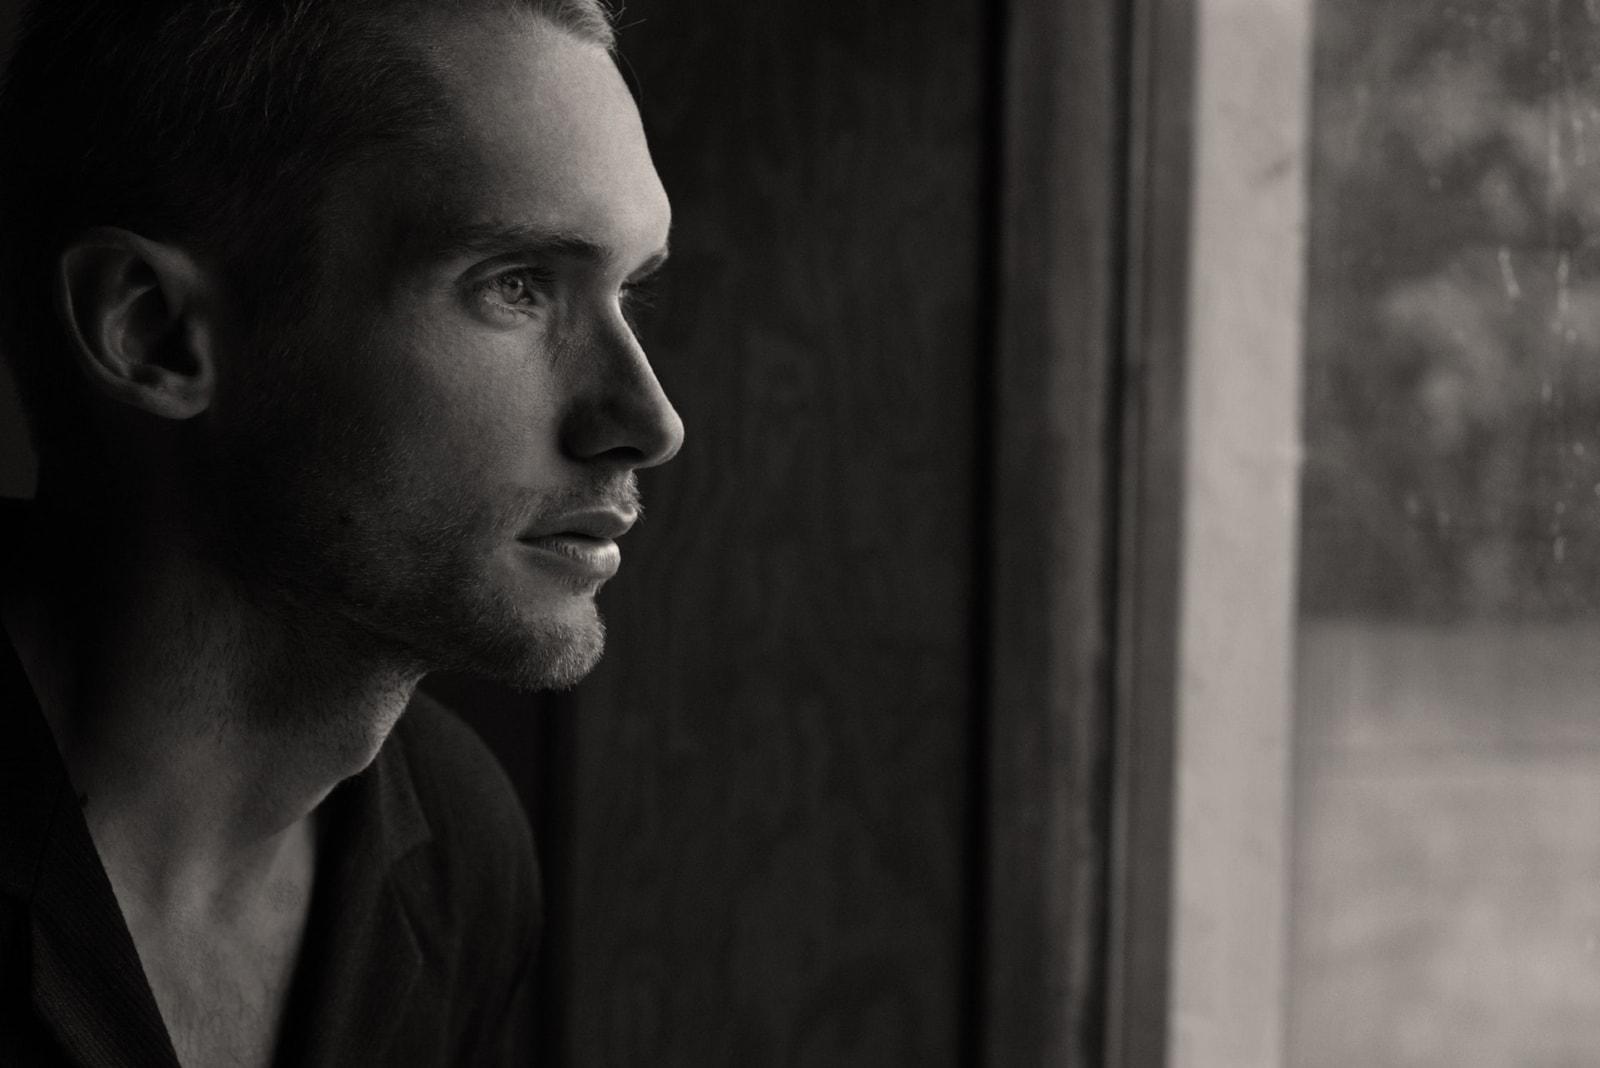 pensive man in black shirt looking through window